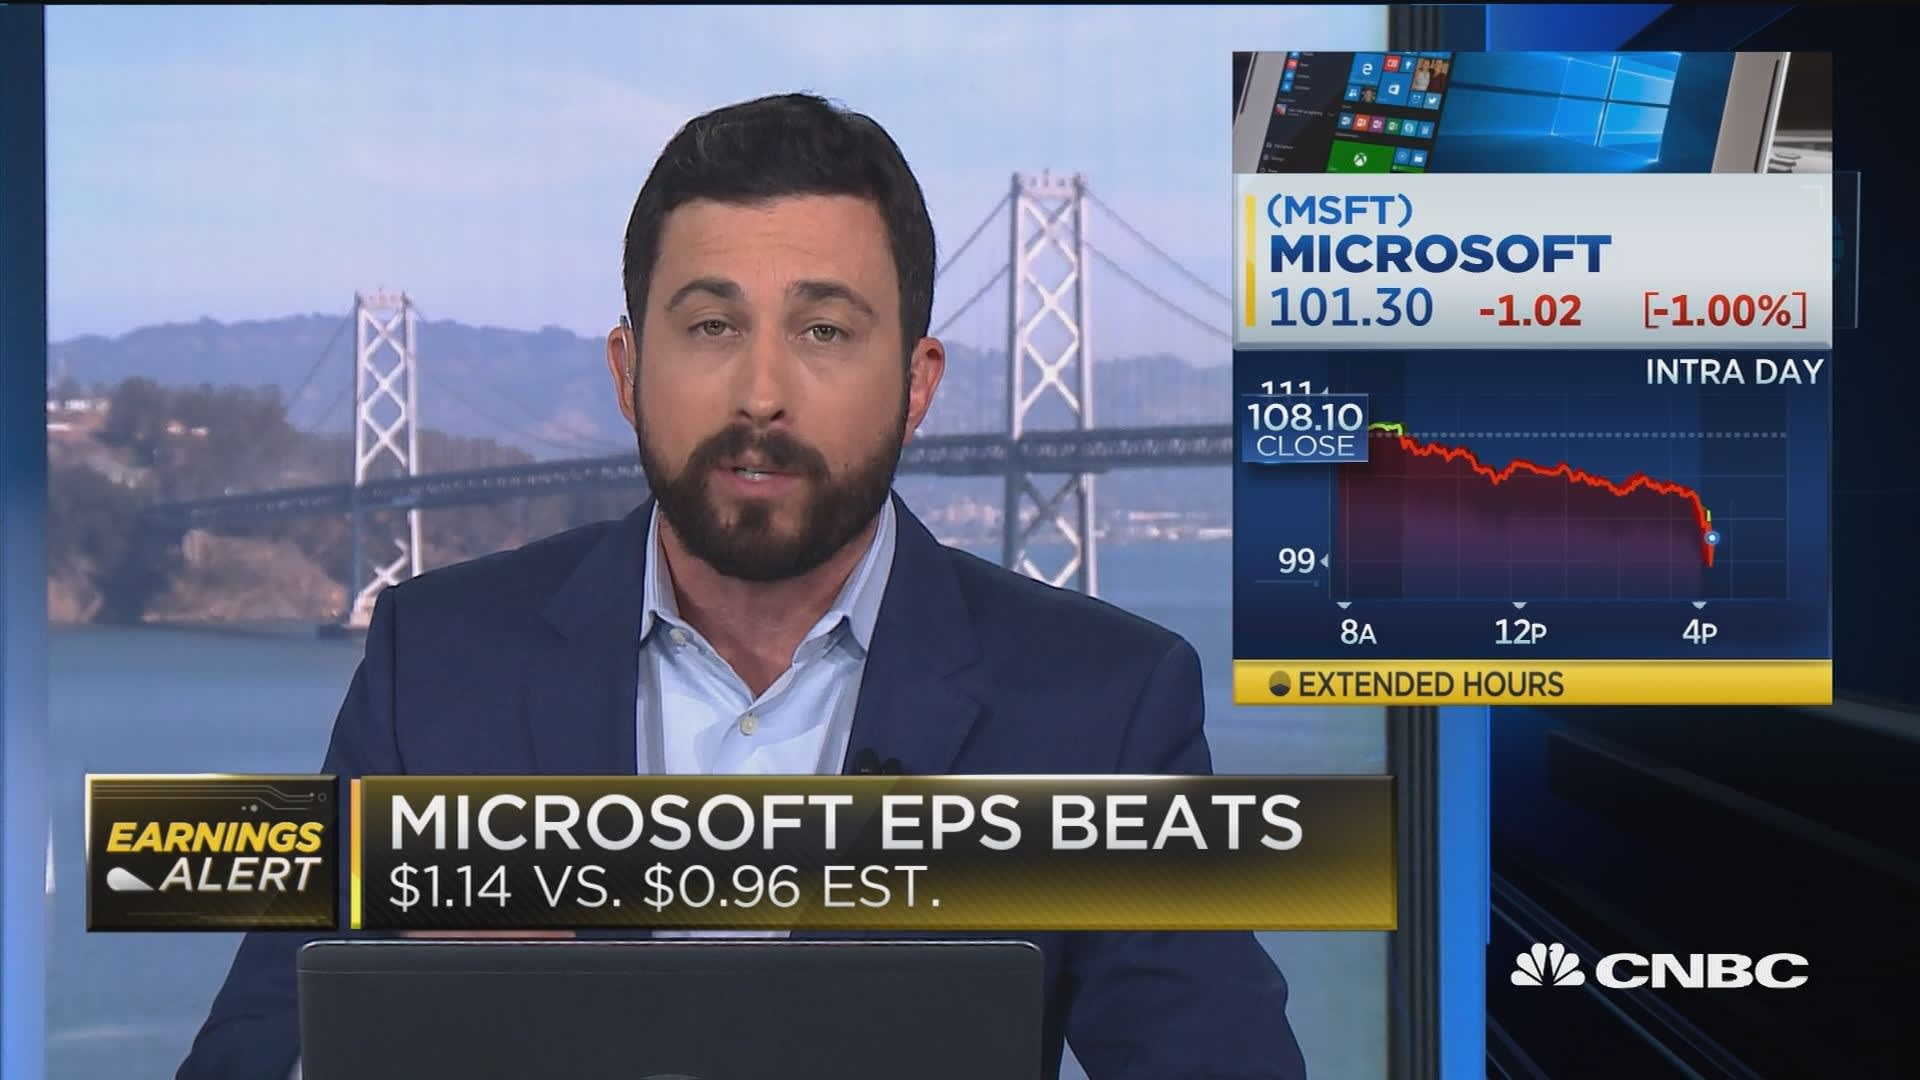 Microsoft beats earnings expectations